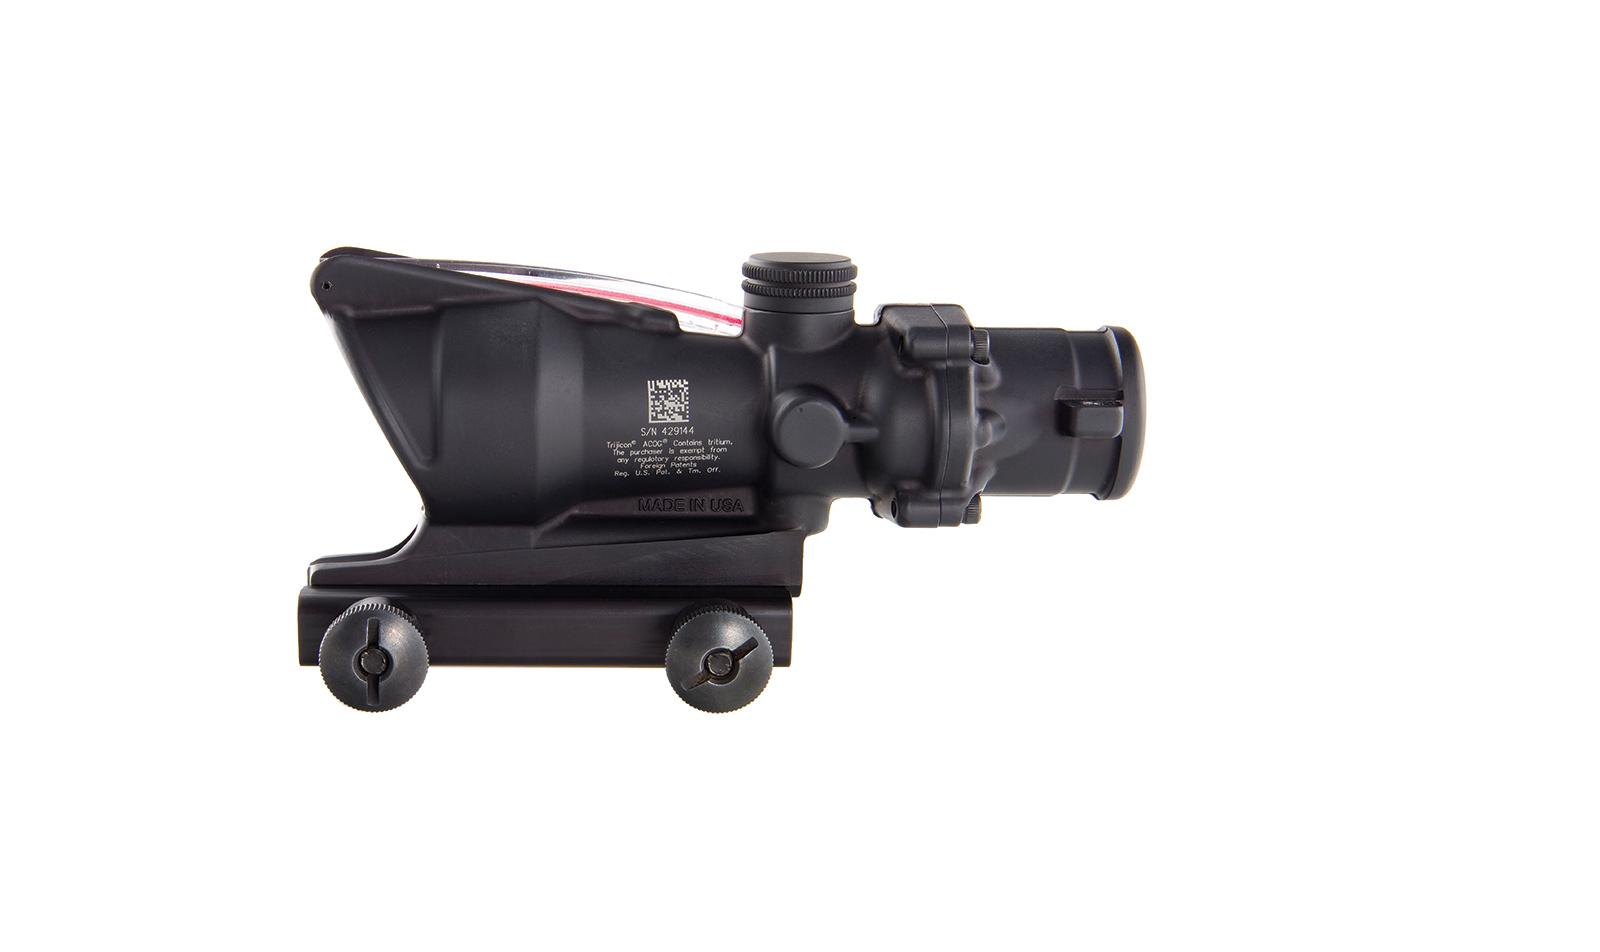 TA31H-68 angle 2